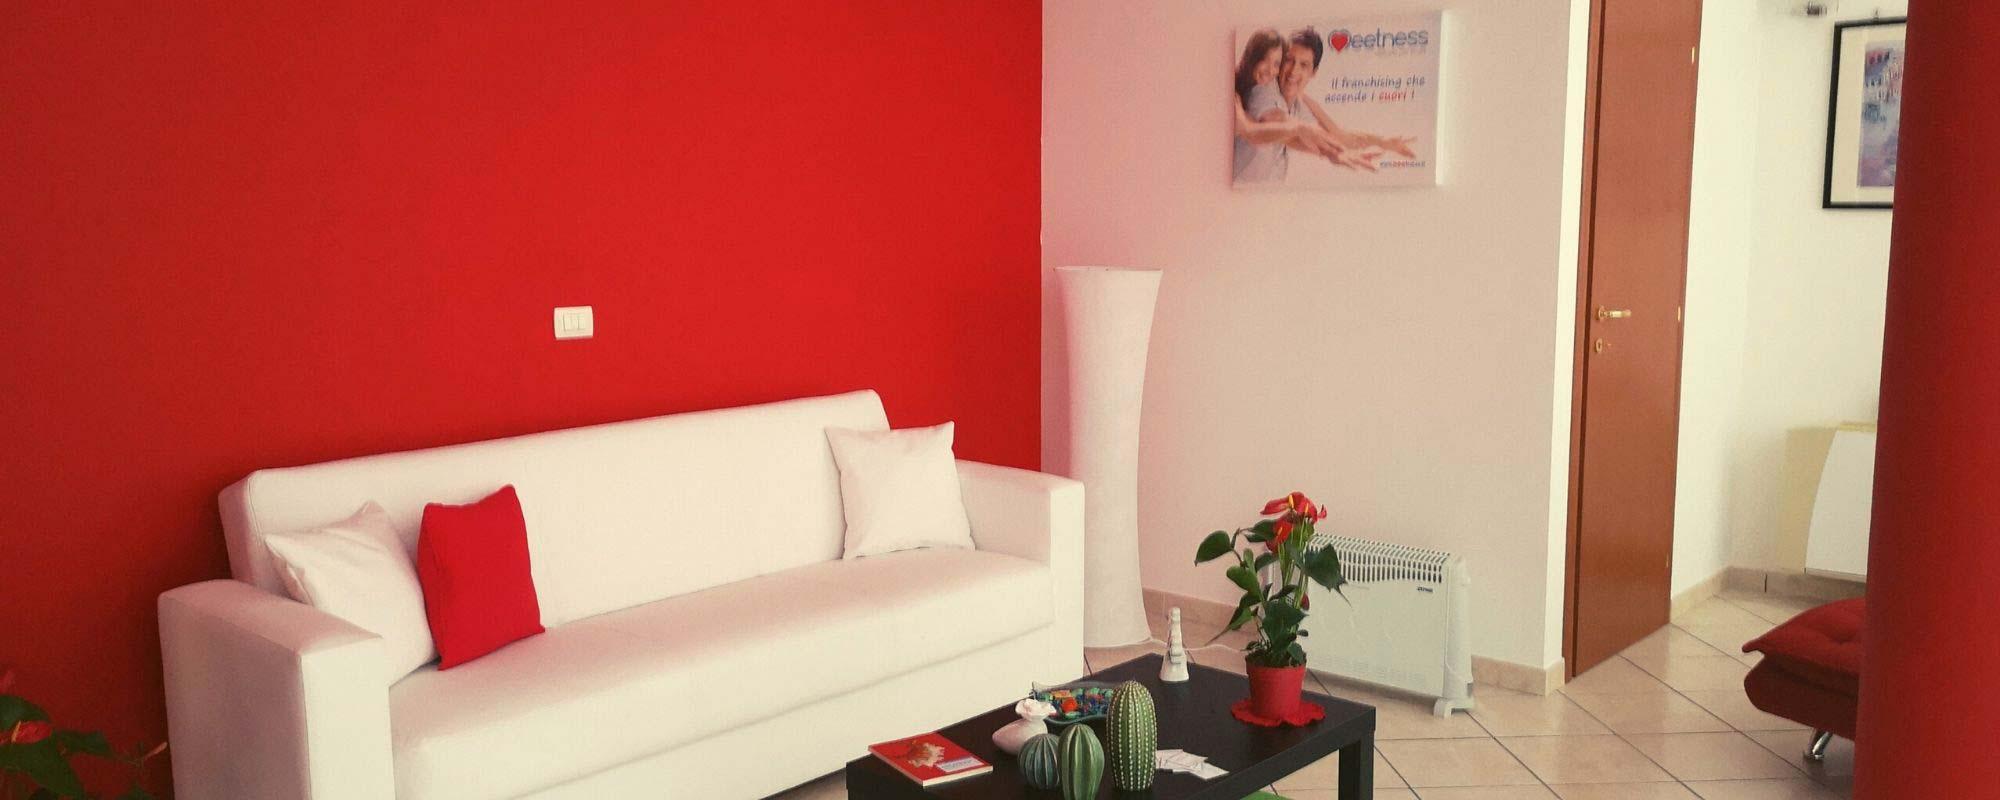 agenzia-matrimoniale-lecce-meetness-franchising-2-1